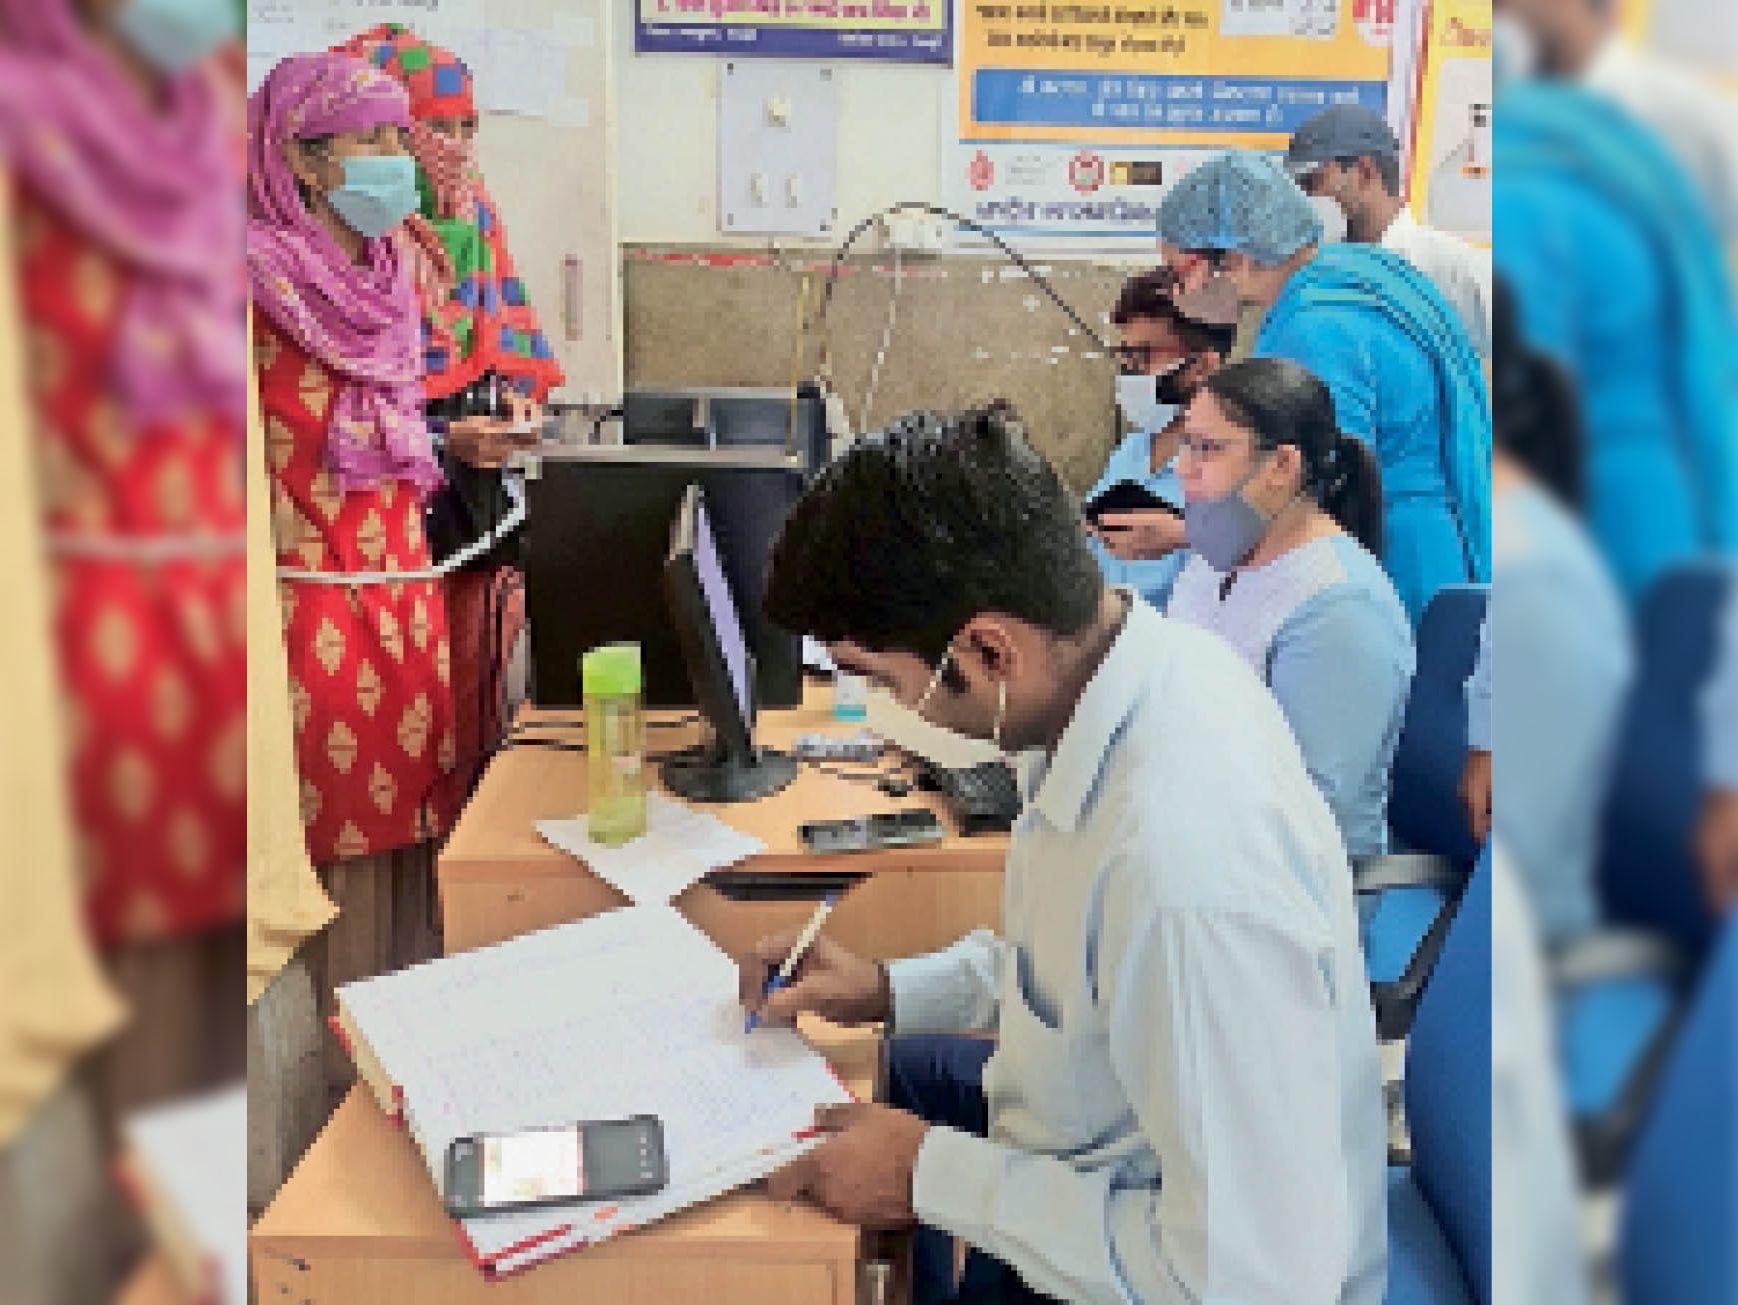 टीकाकरण के लिए रजिस्ट्रेशन करते लोग। - Dainik Bhaskar